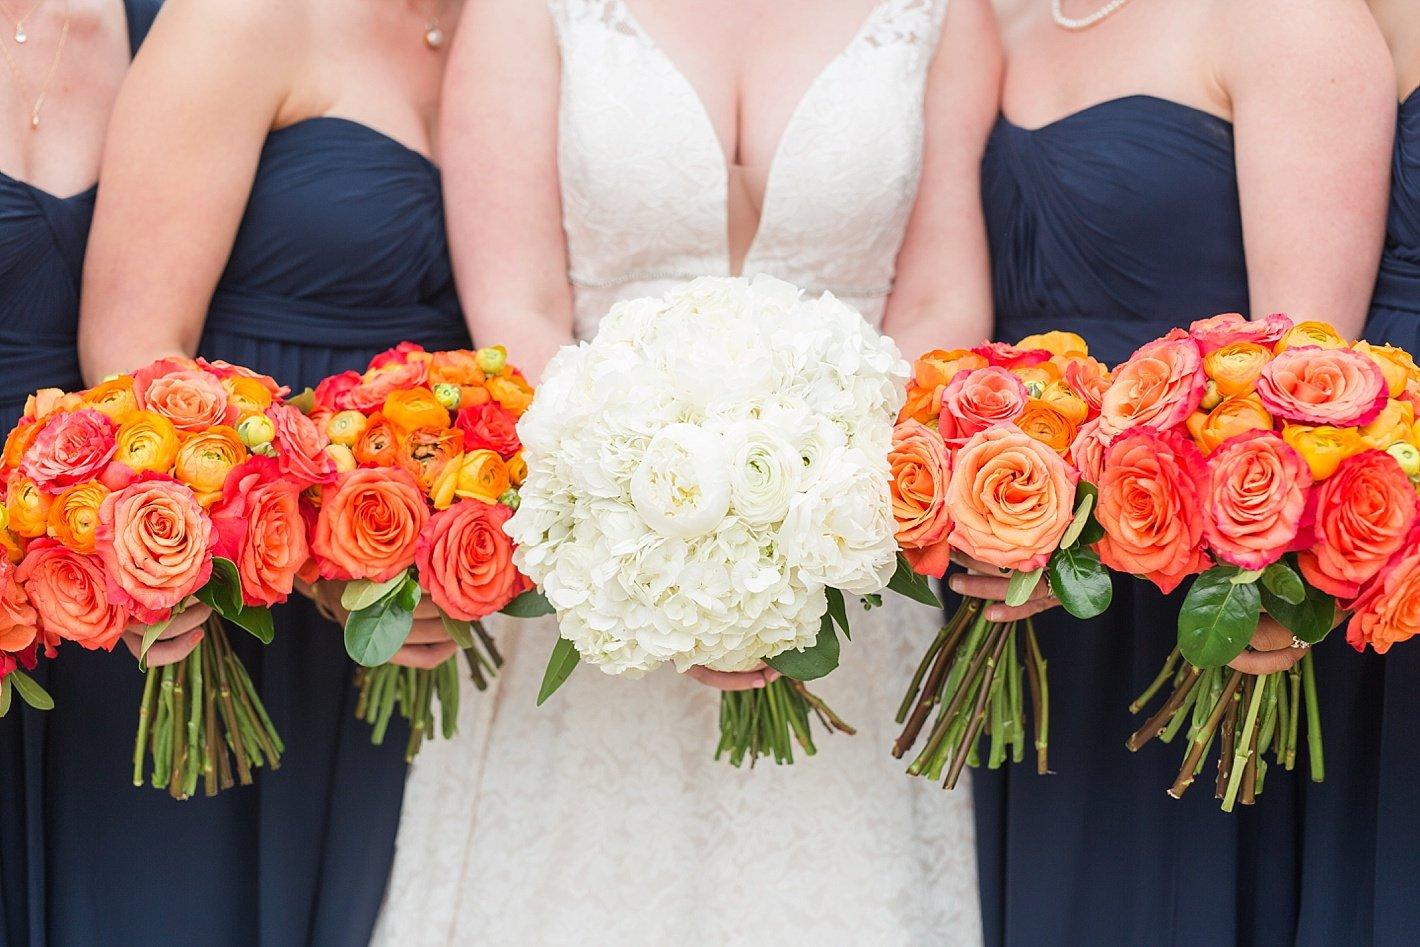 Navy bridesmaid dresses Jenny Yoo dresses peach bouquets roses peonies